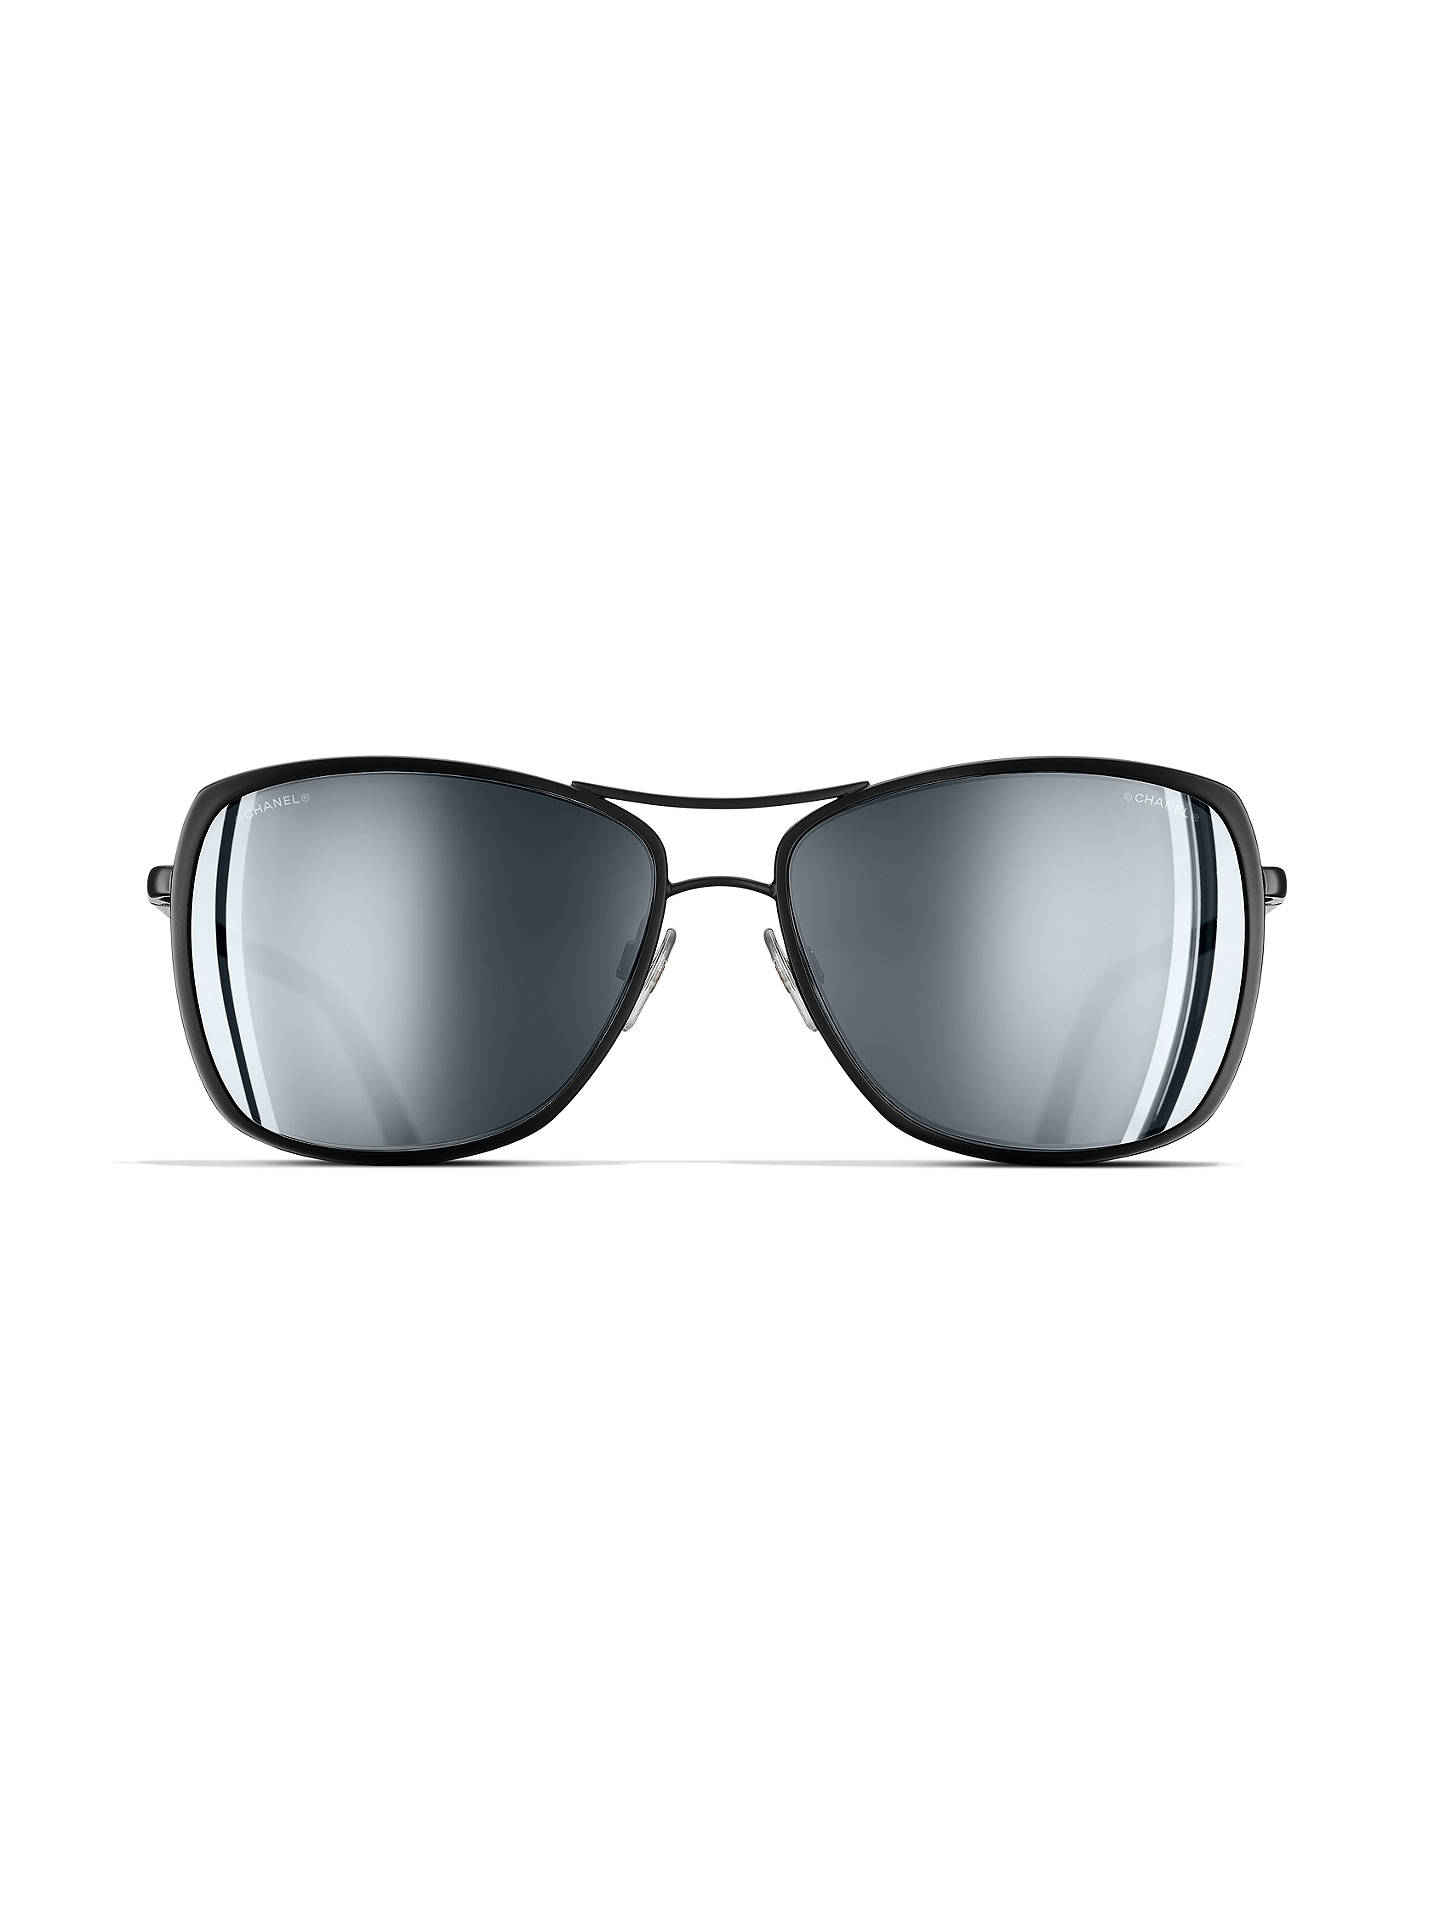 8336279cbe ... BuyCHANEL Pilot Sunglasses CH4224 Black Online at johnlewis.com ...